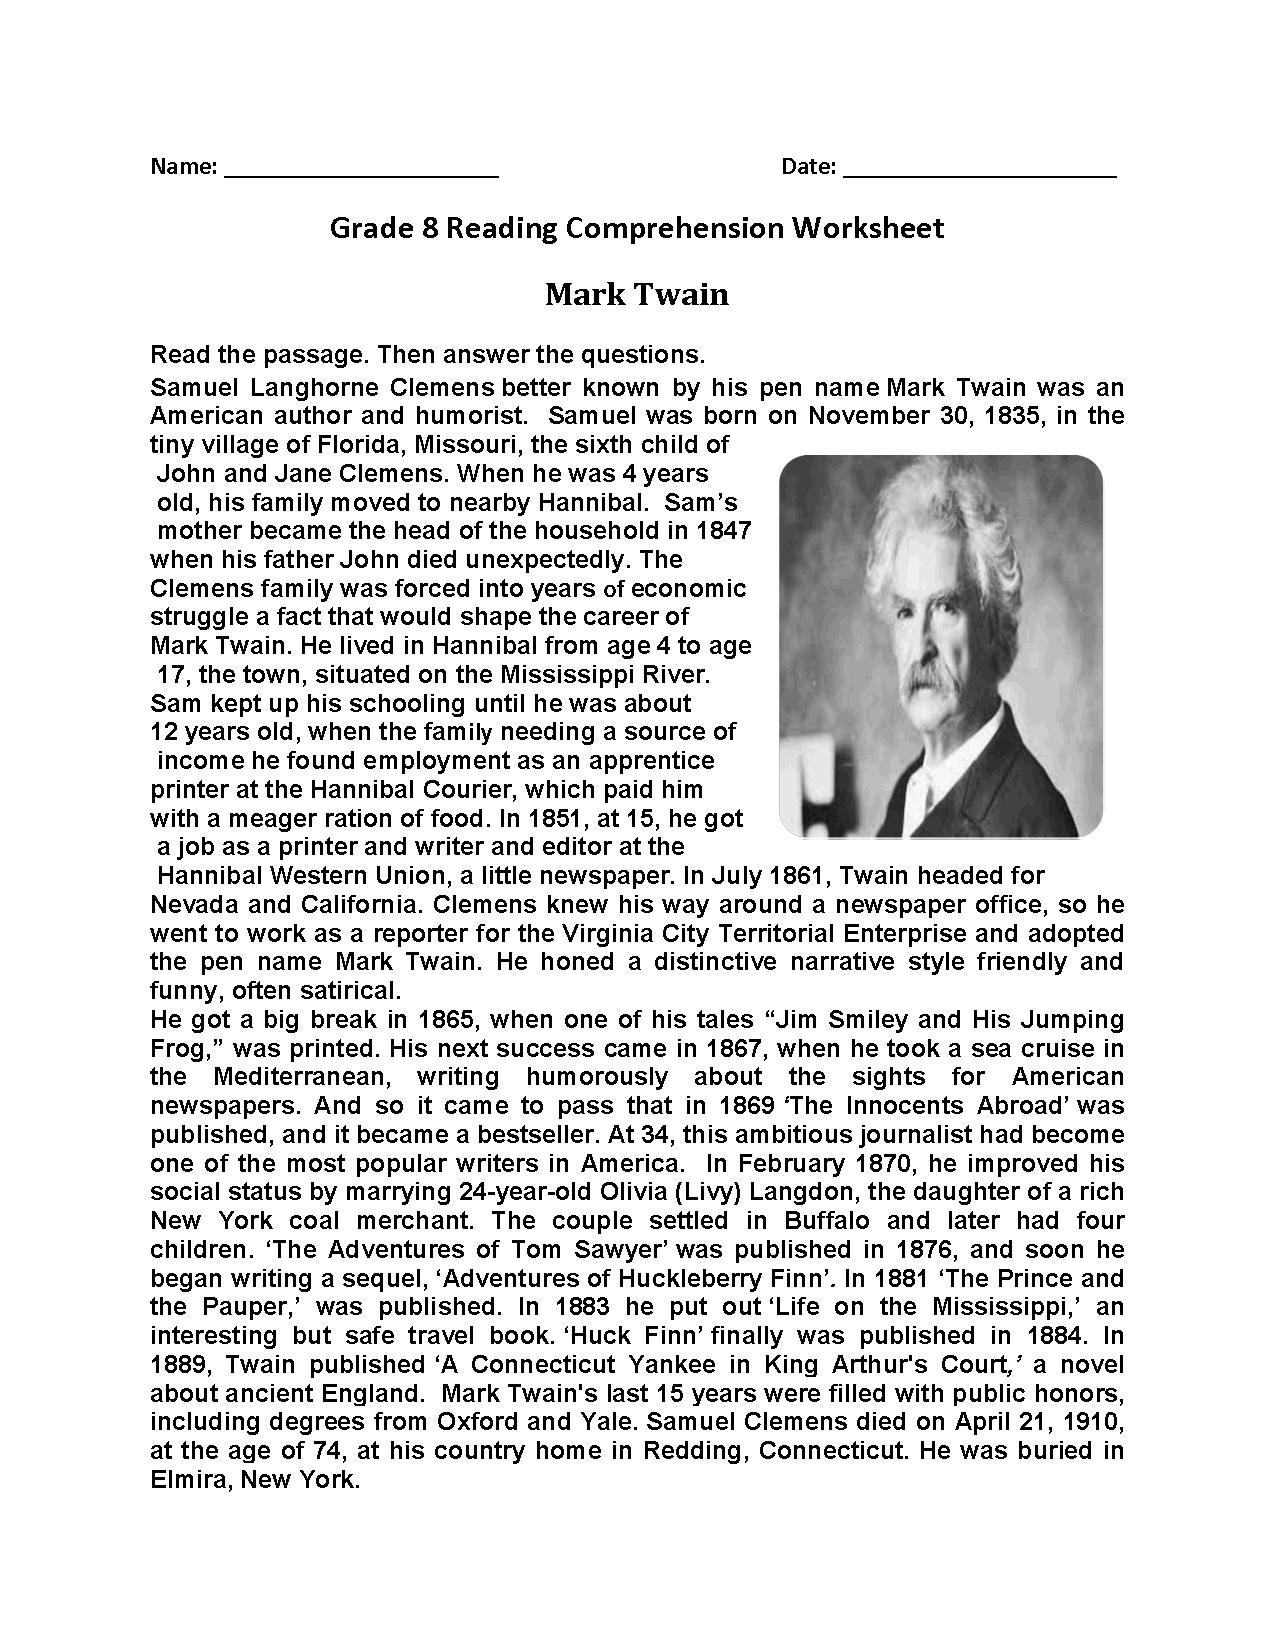 Mark Twain Eighth Grade Reading Worksheets   8th grade reading [ 1650 x 1275 Pixel ]